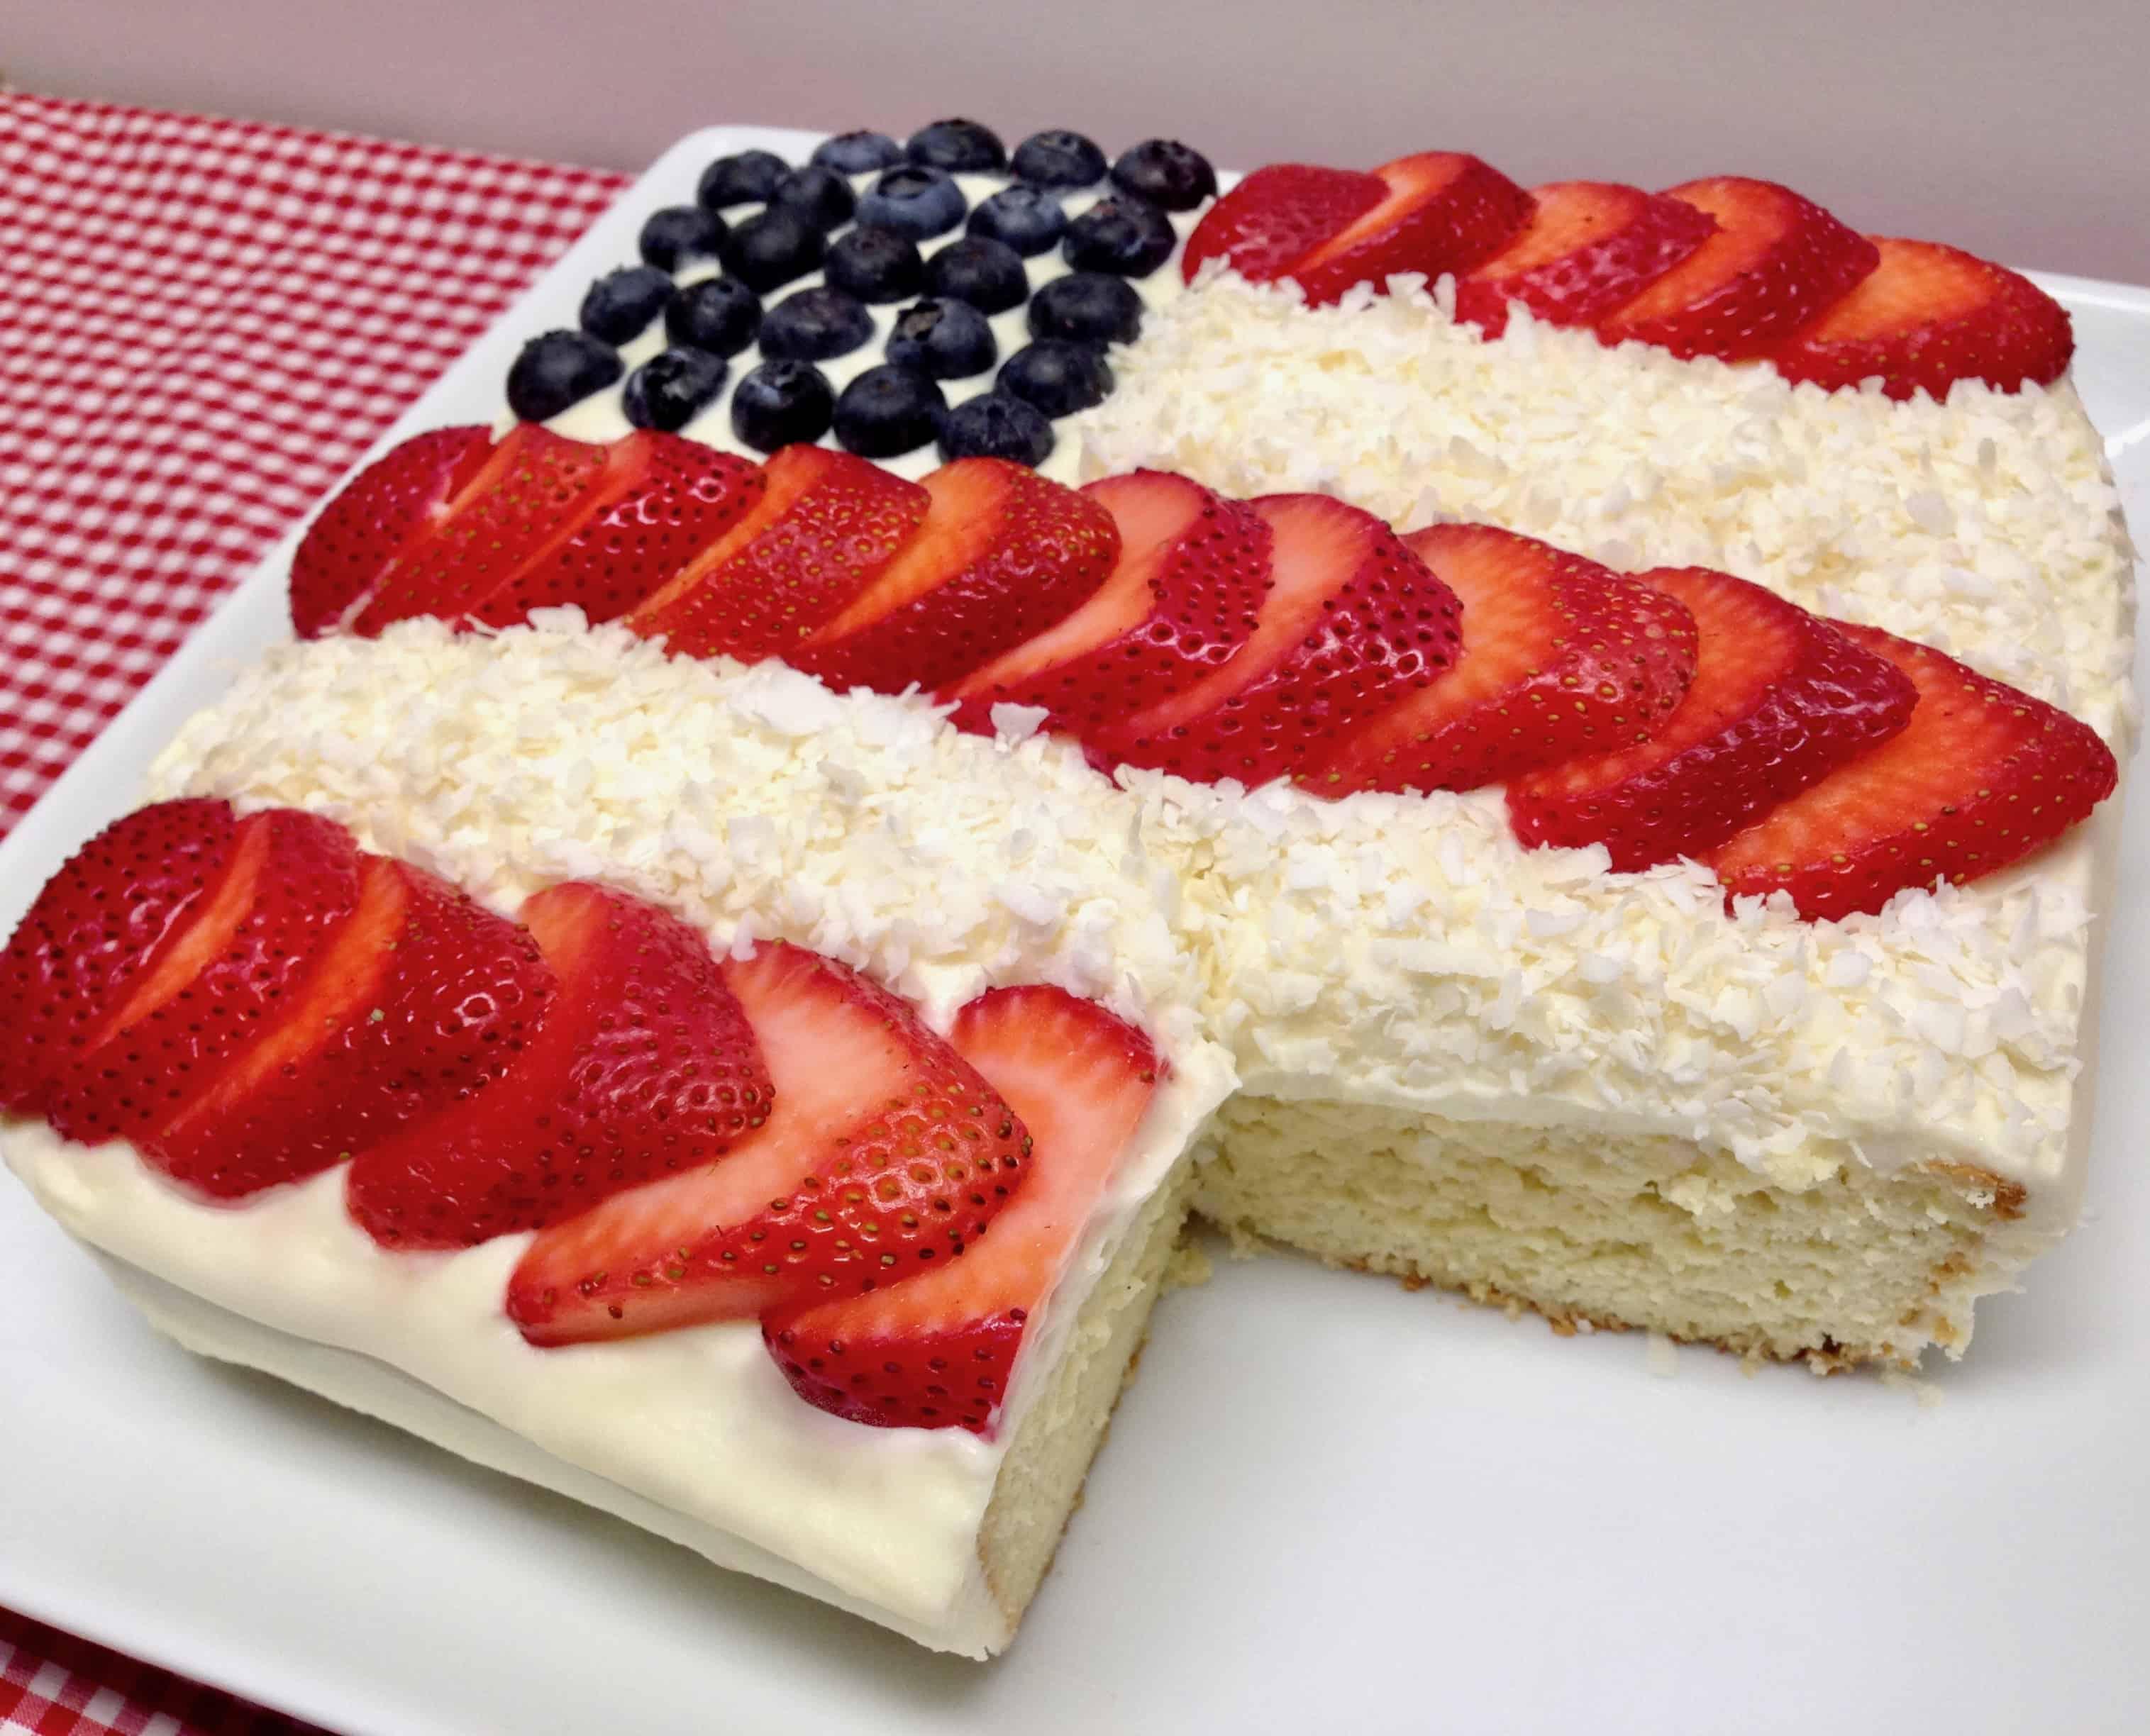 American Flag Cake - Keto, Low Carb & Gluten Free